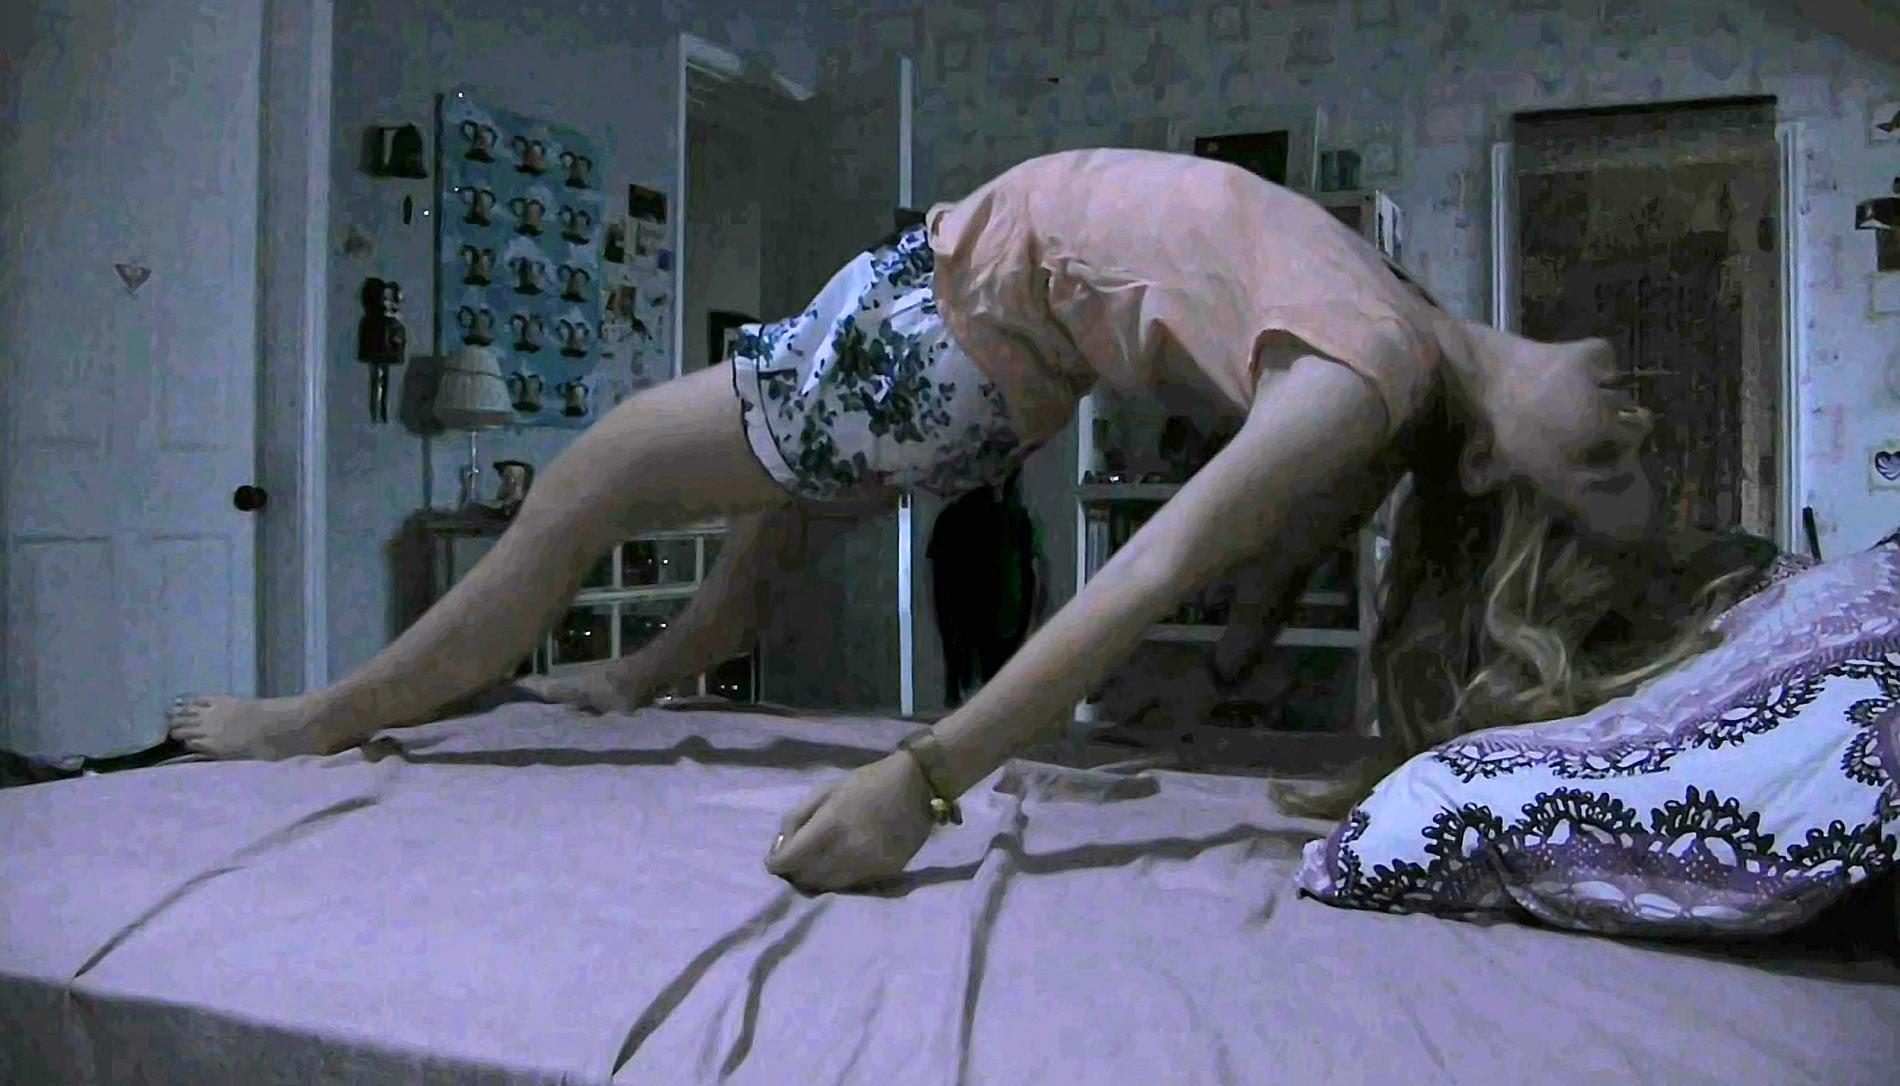 foto terrorifica de chica flotando sobre la cama